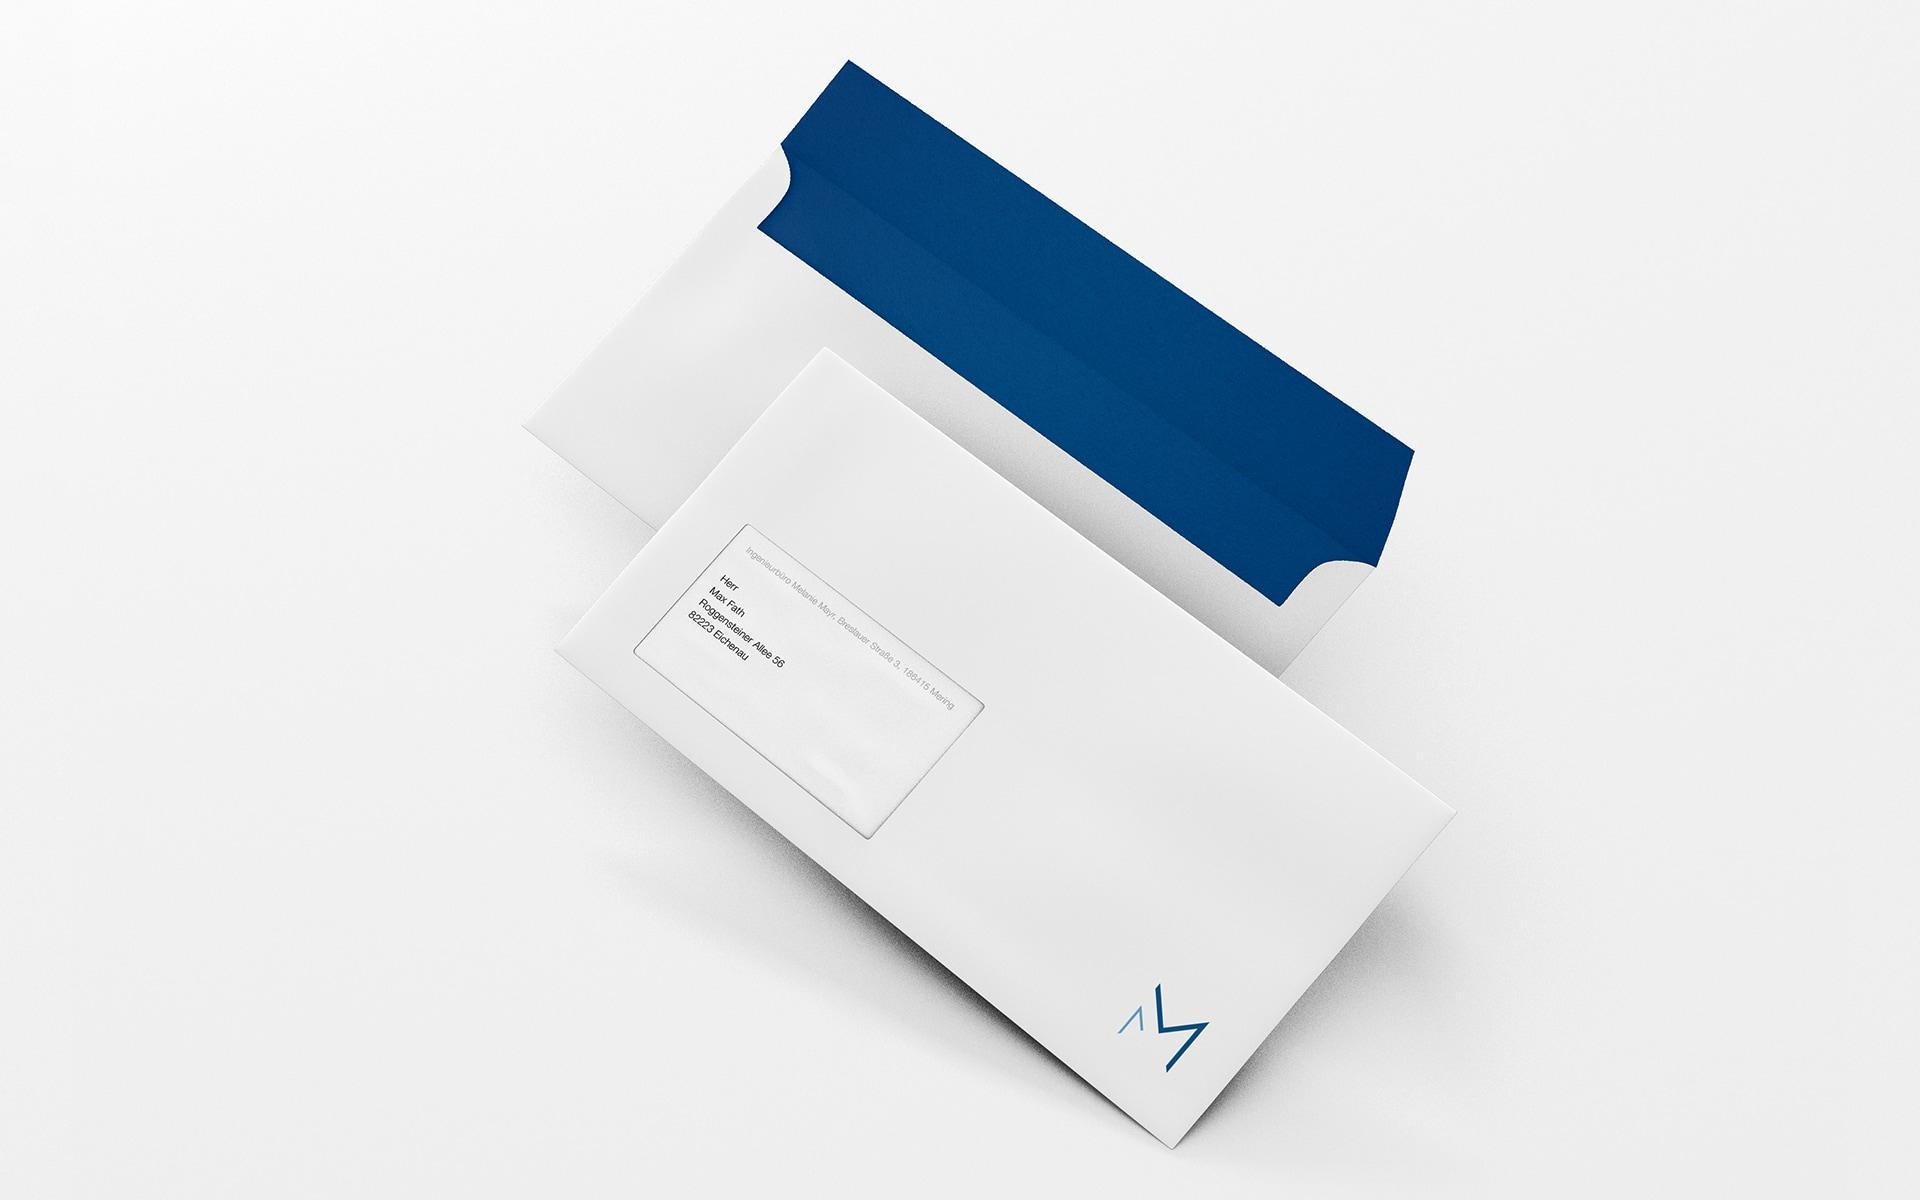 maxfath-ingenieurbuero-melanie-mayr-mering-branding-kuvert